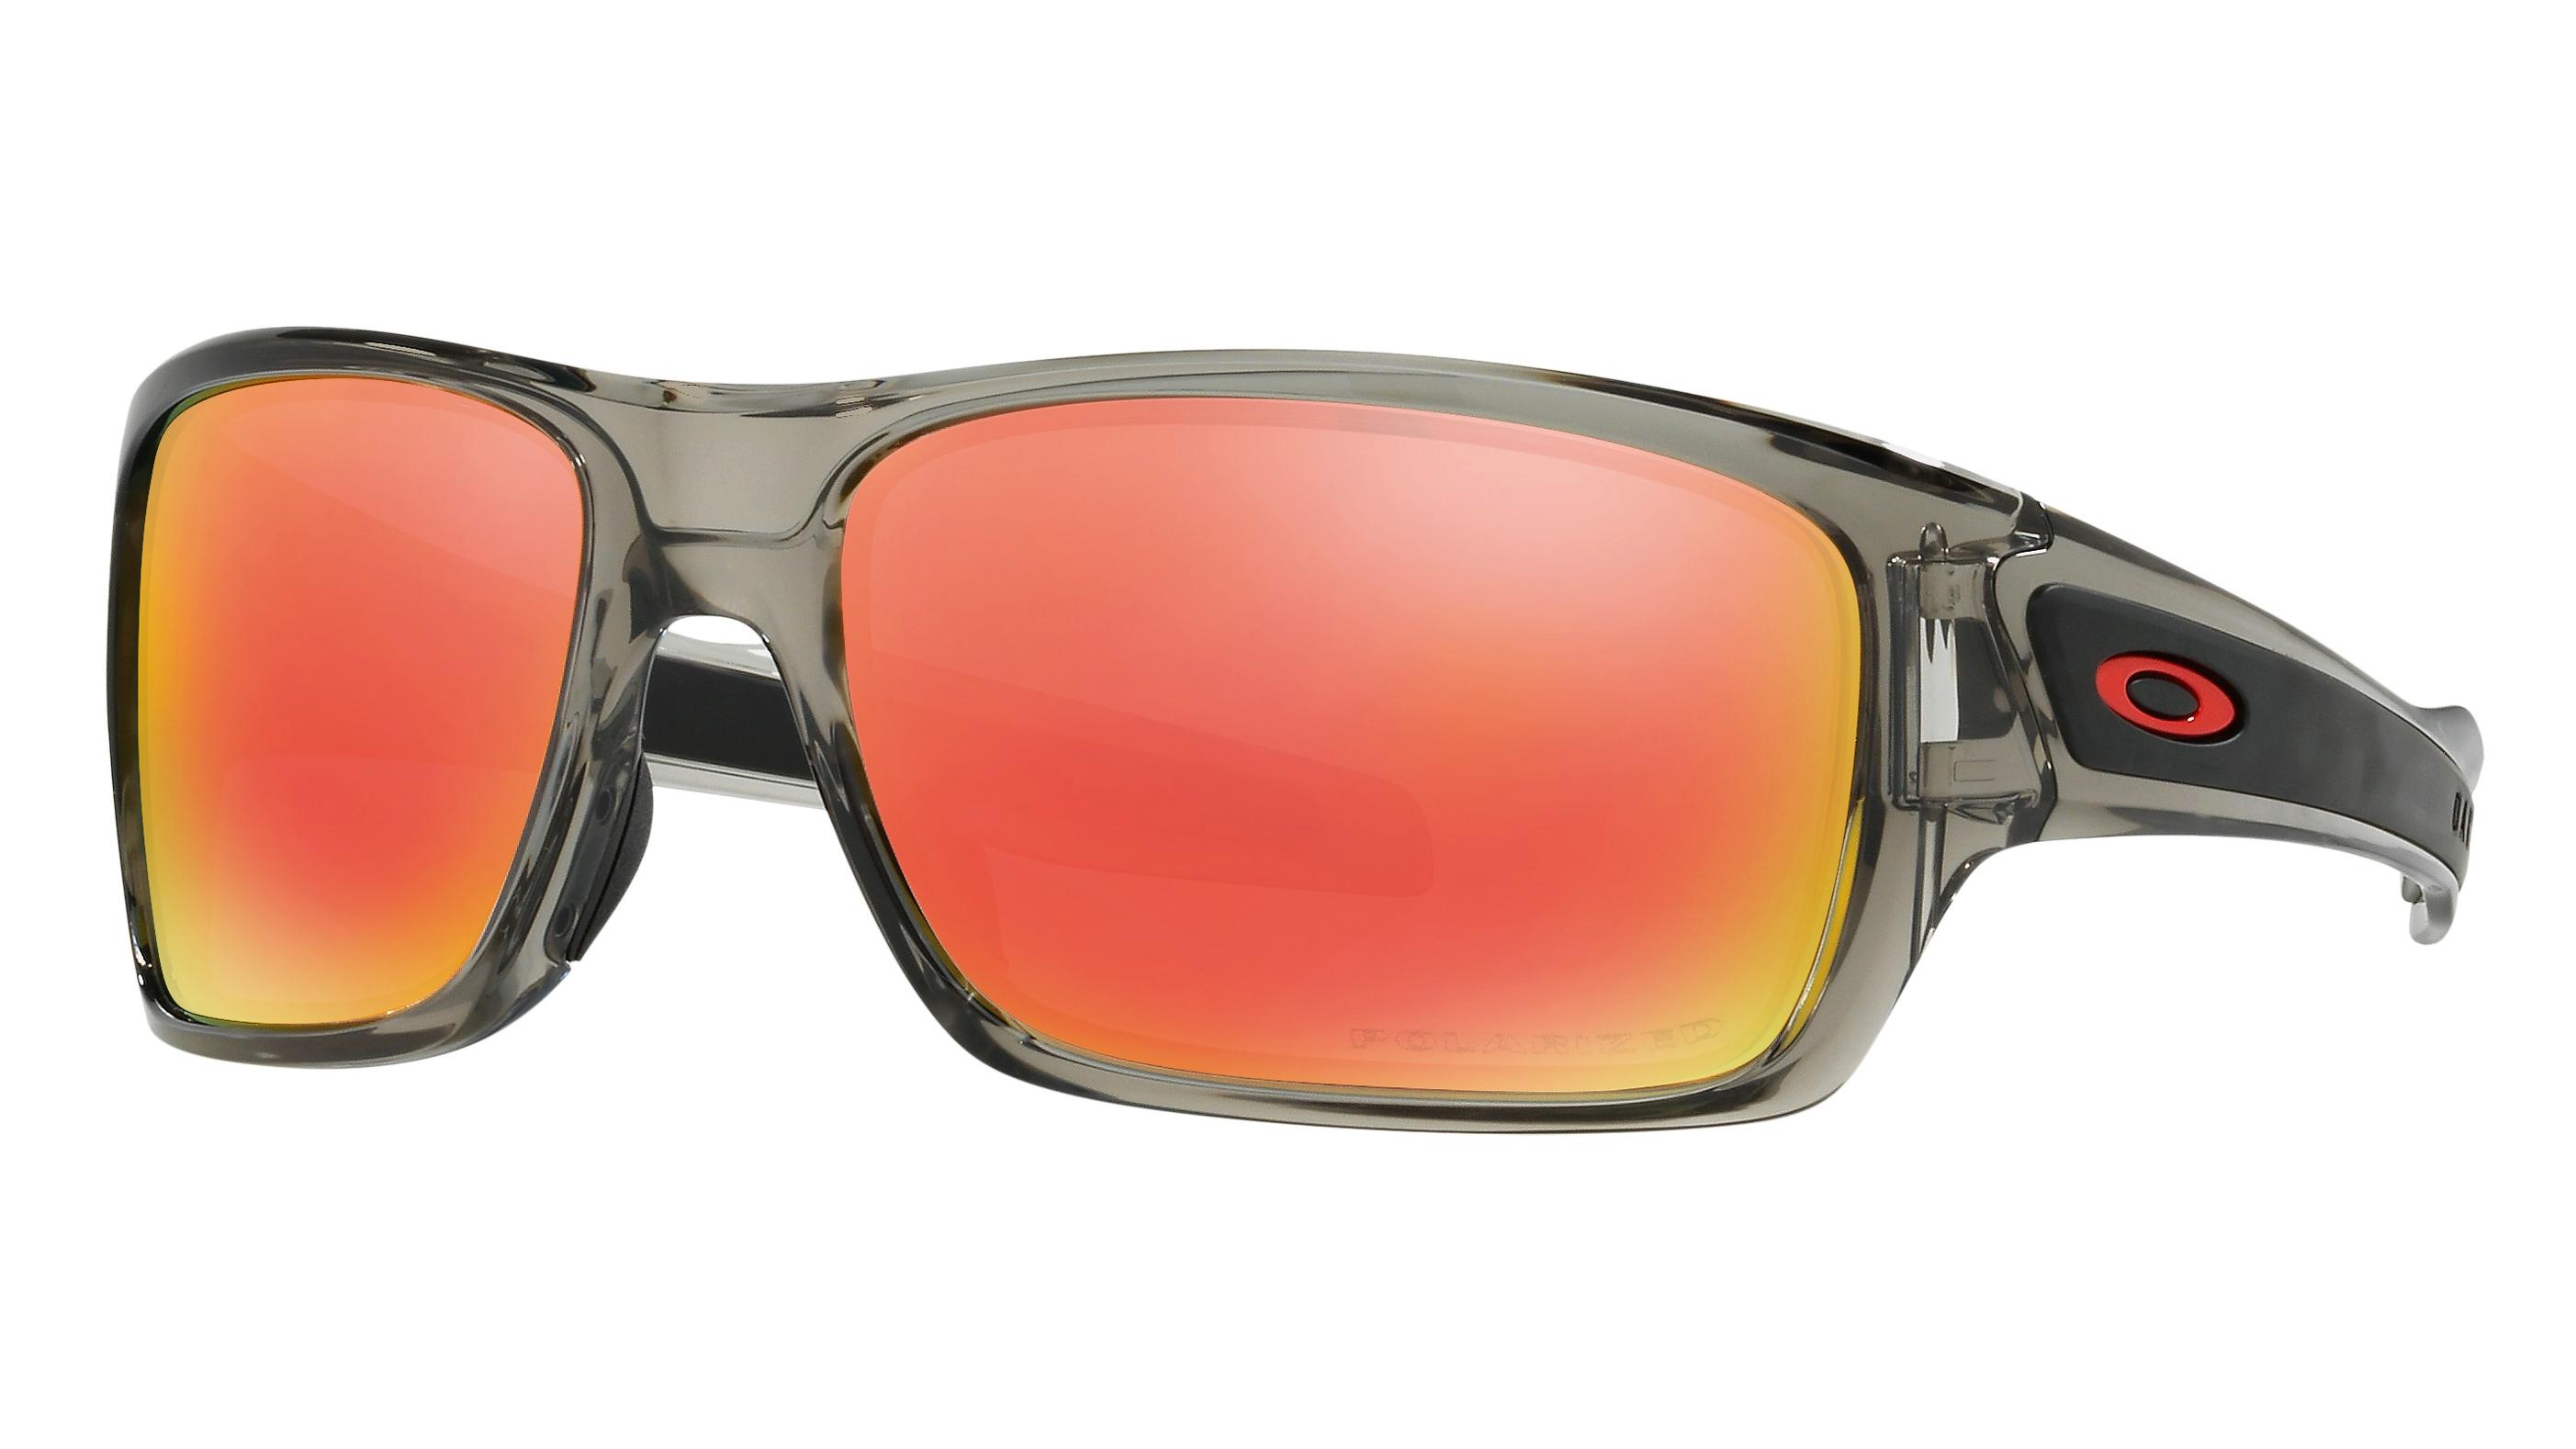 ad13599a702e4 Oakley Turbine Cycling Sunglasses